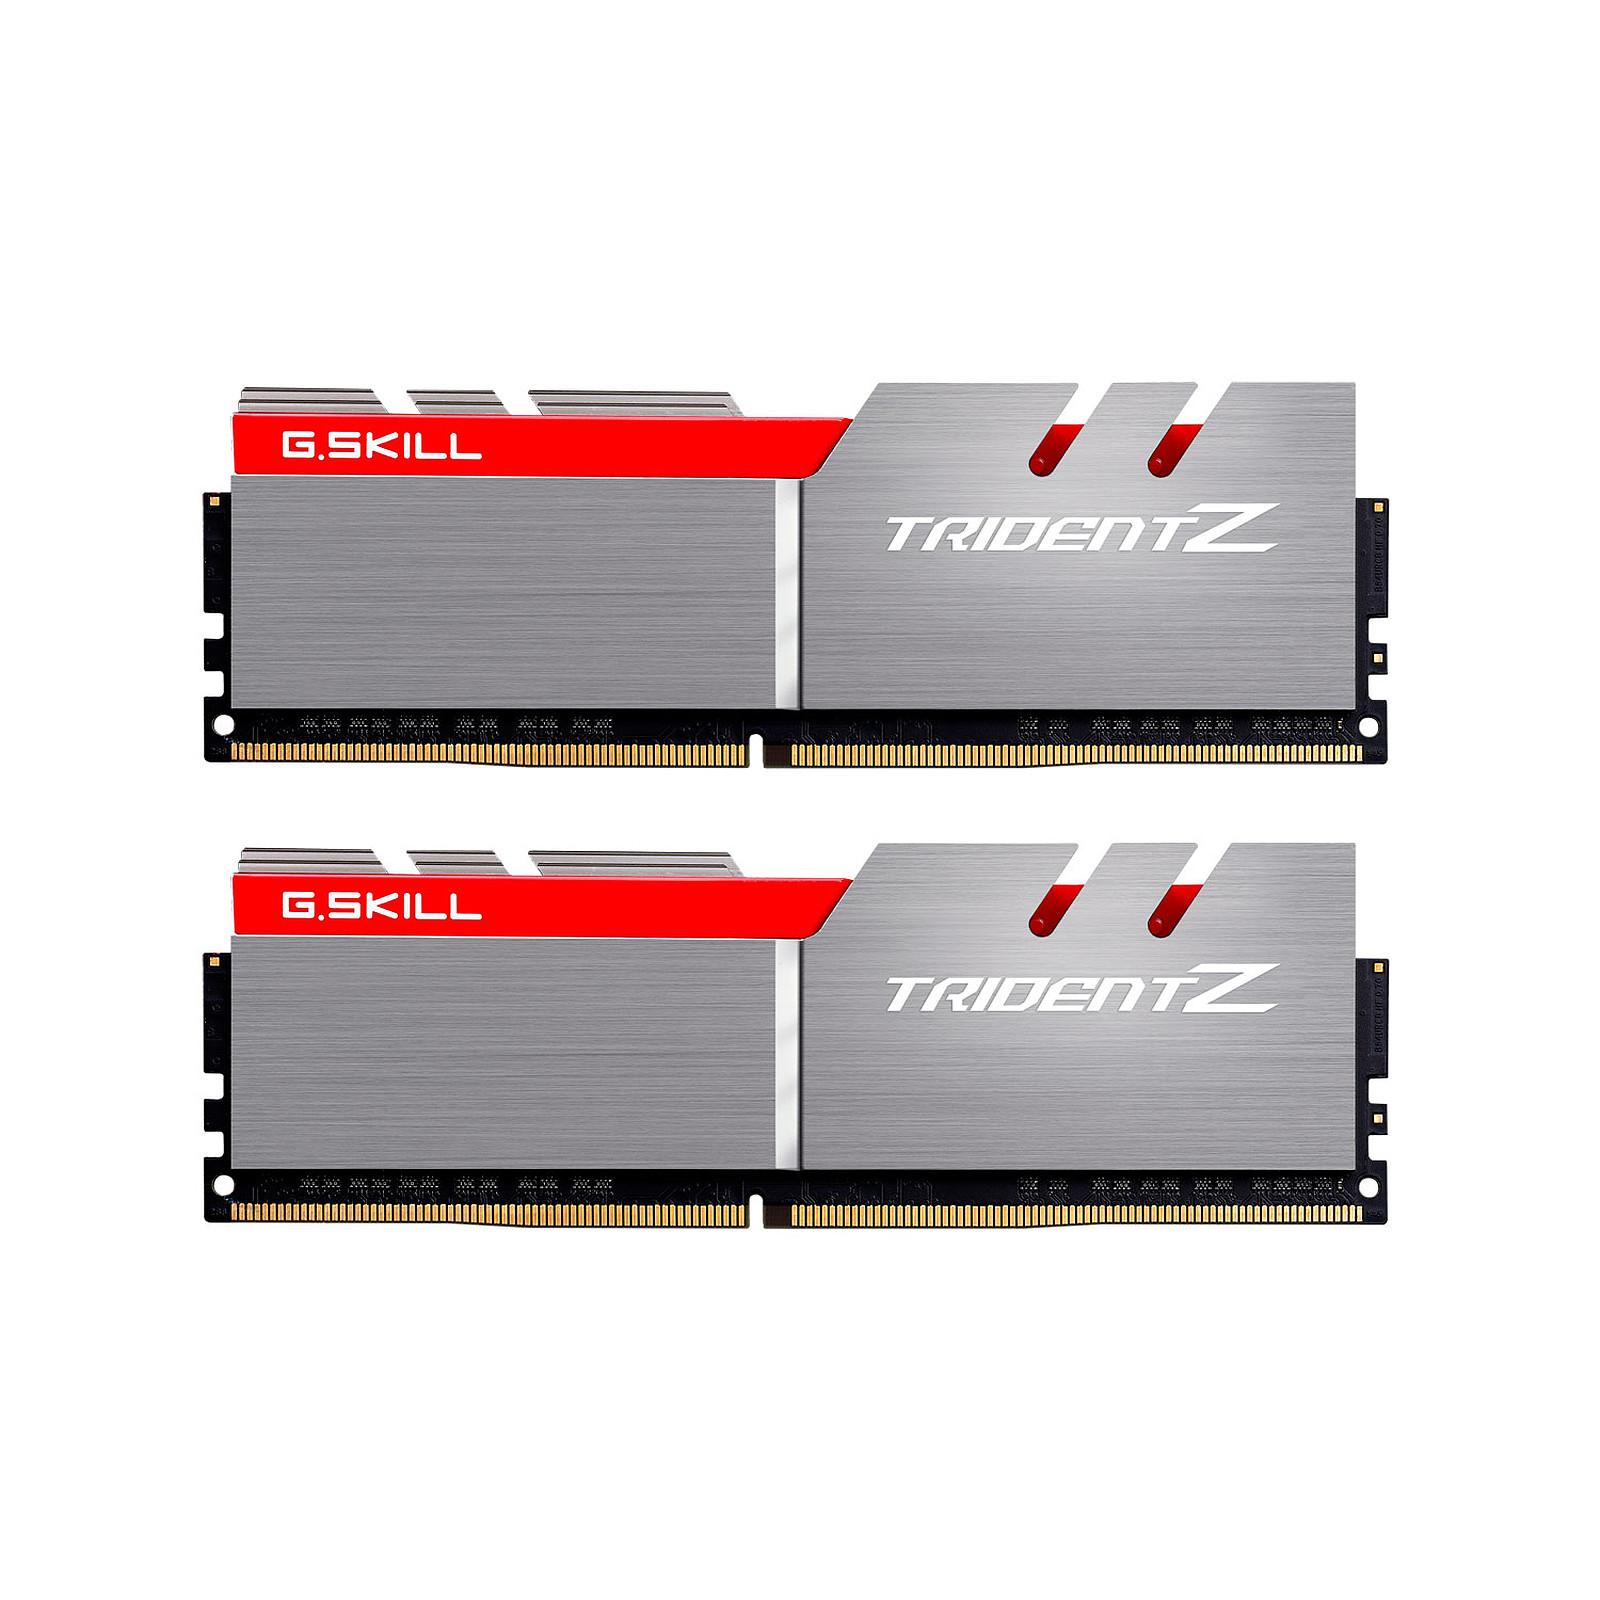 G.Skill Trident Z 8 Go (2x 4 Go) DDR4 2800 MHz CL15